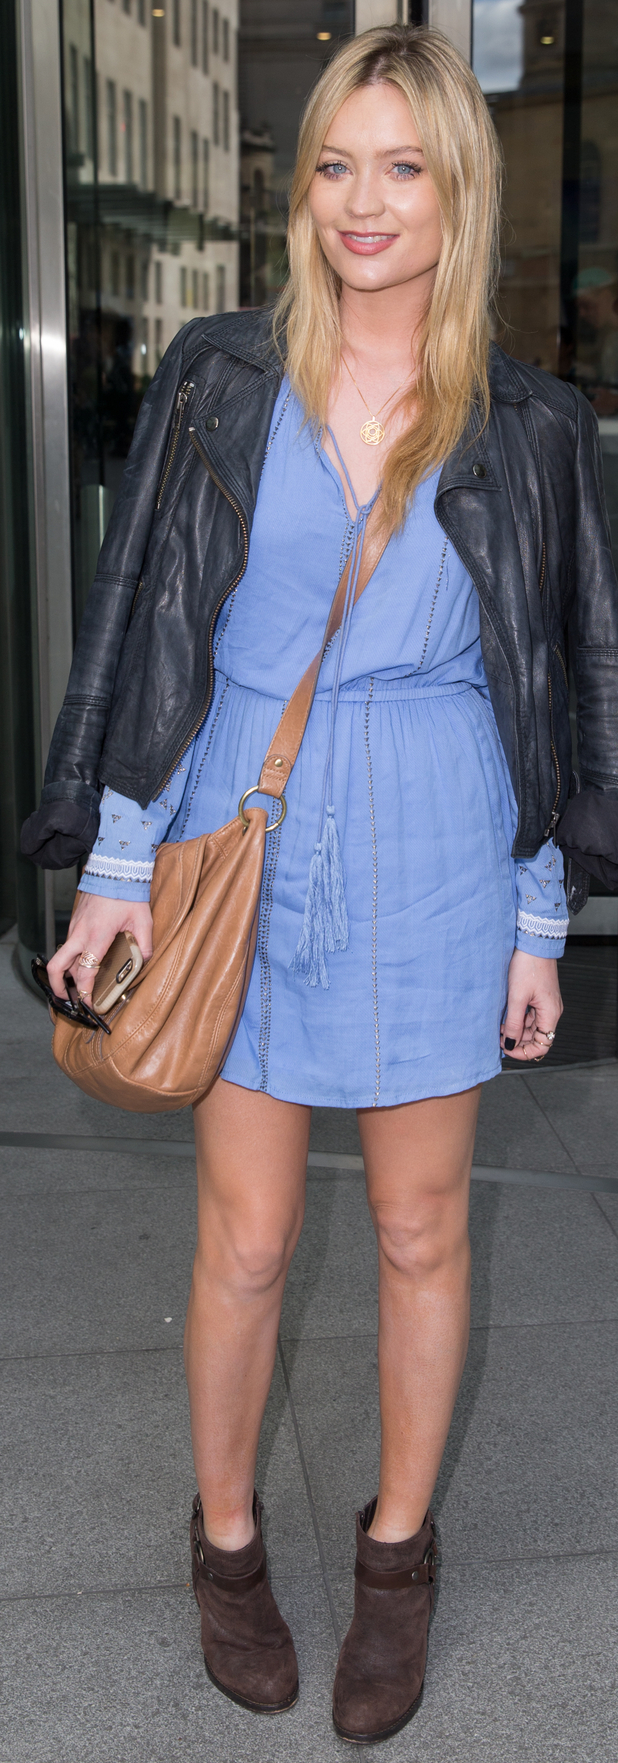 TV presenter Laura Whitmore outside BBC studios in London 29th July 2015